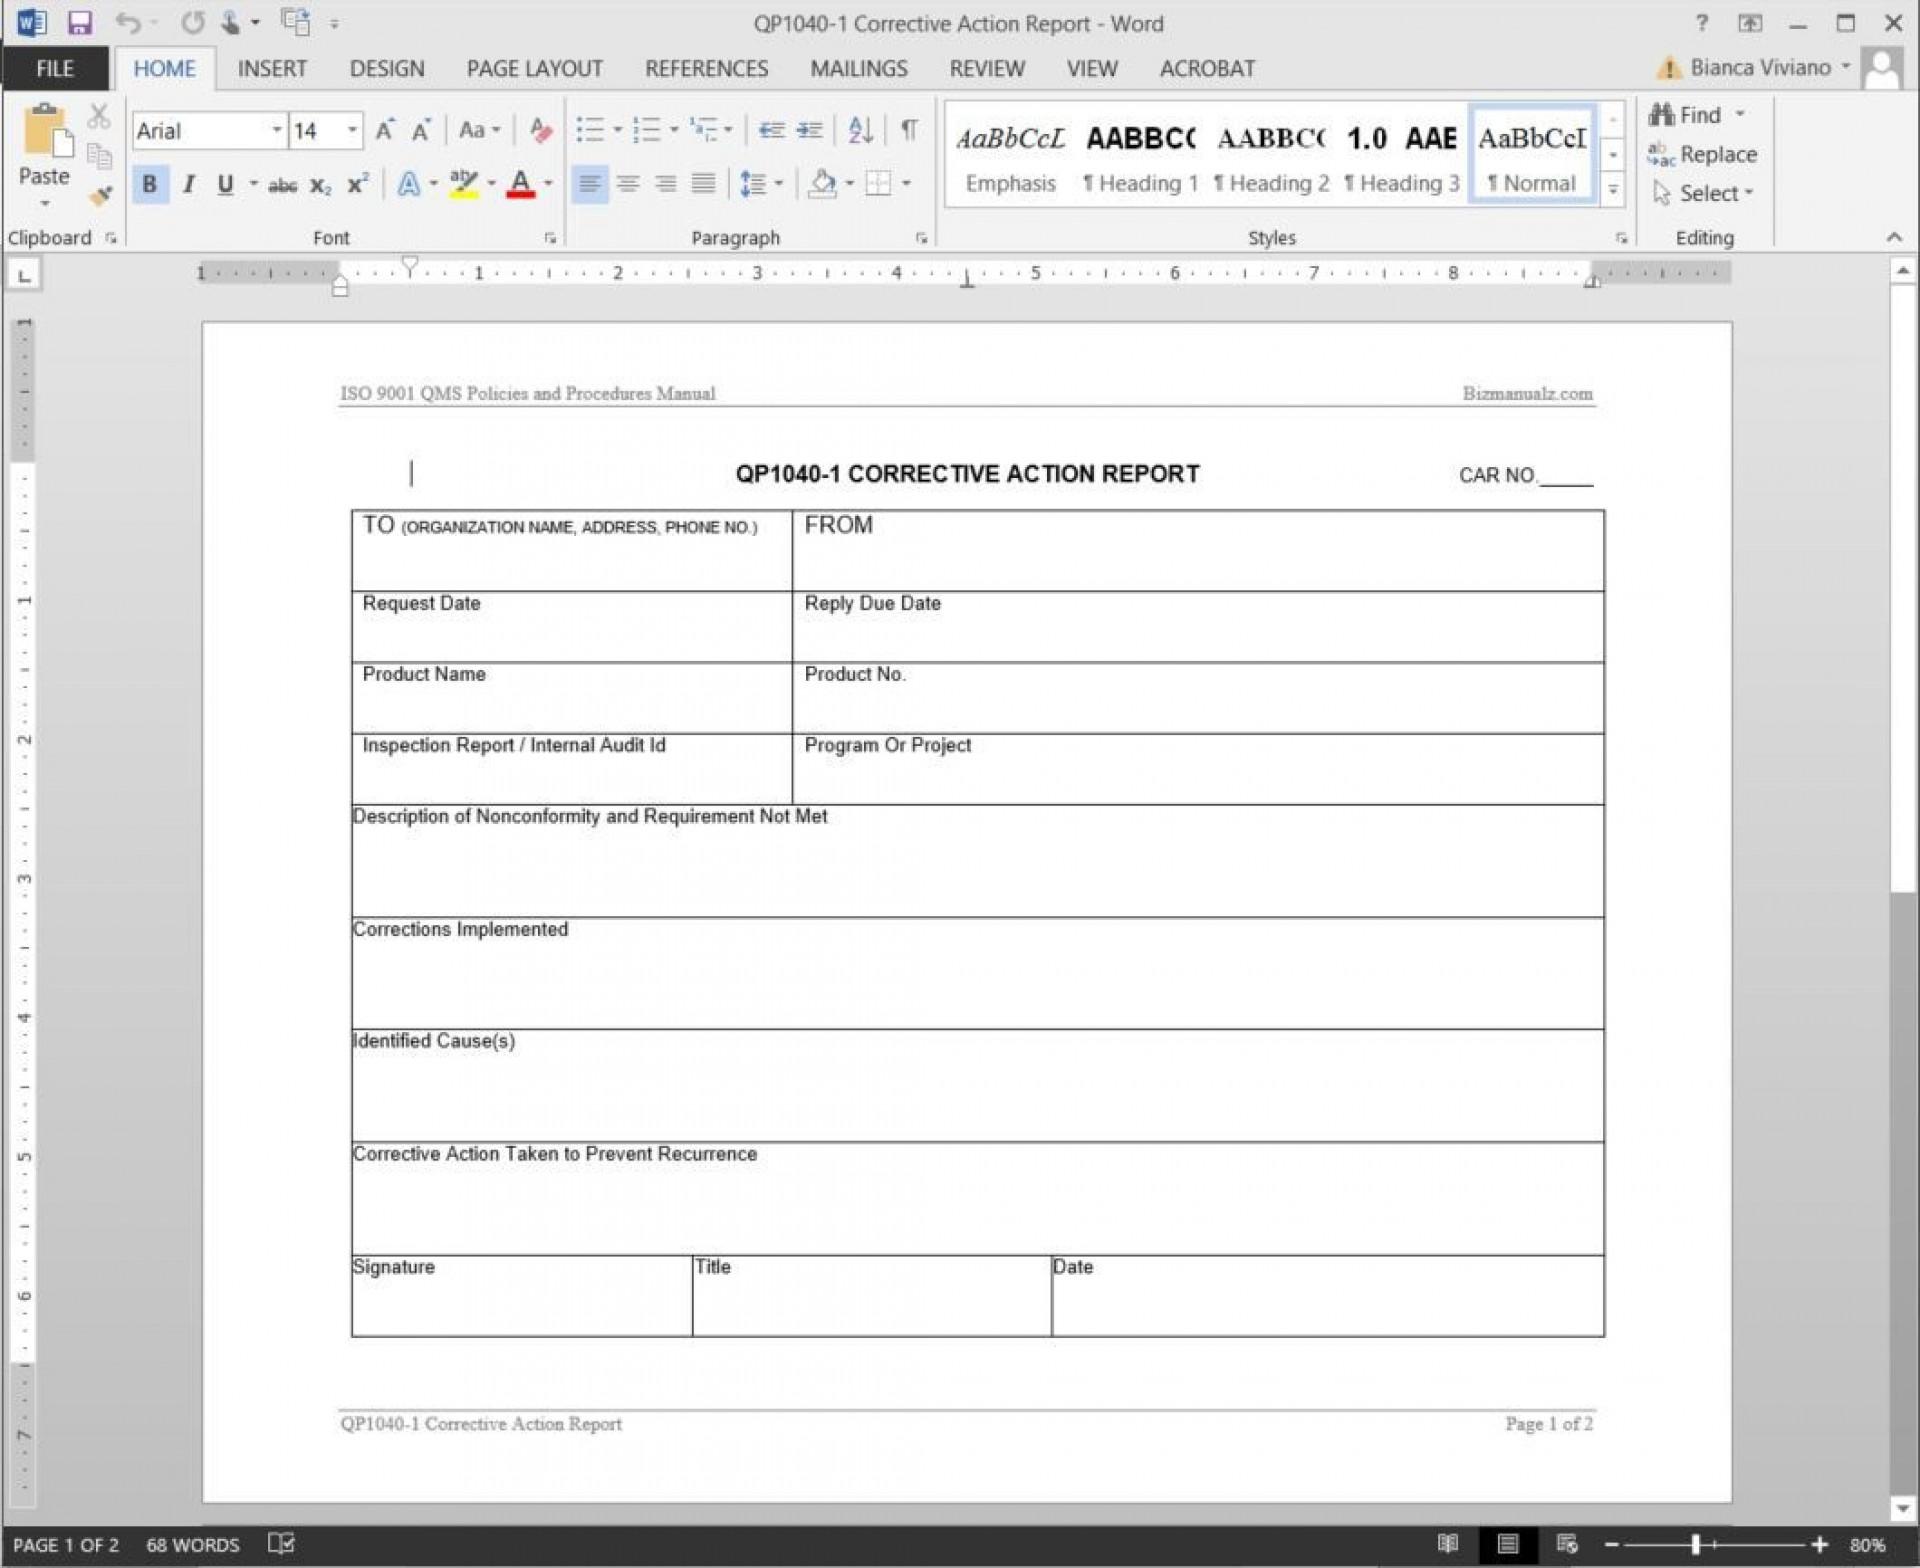 006 Striking Corrective Action Report Template Design  Doc 8d Format Pdf1920